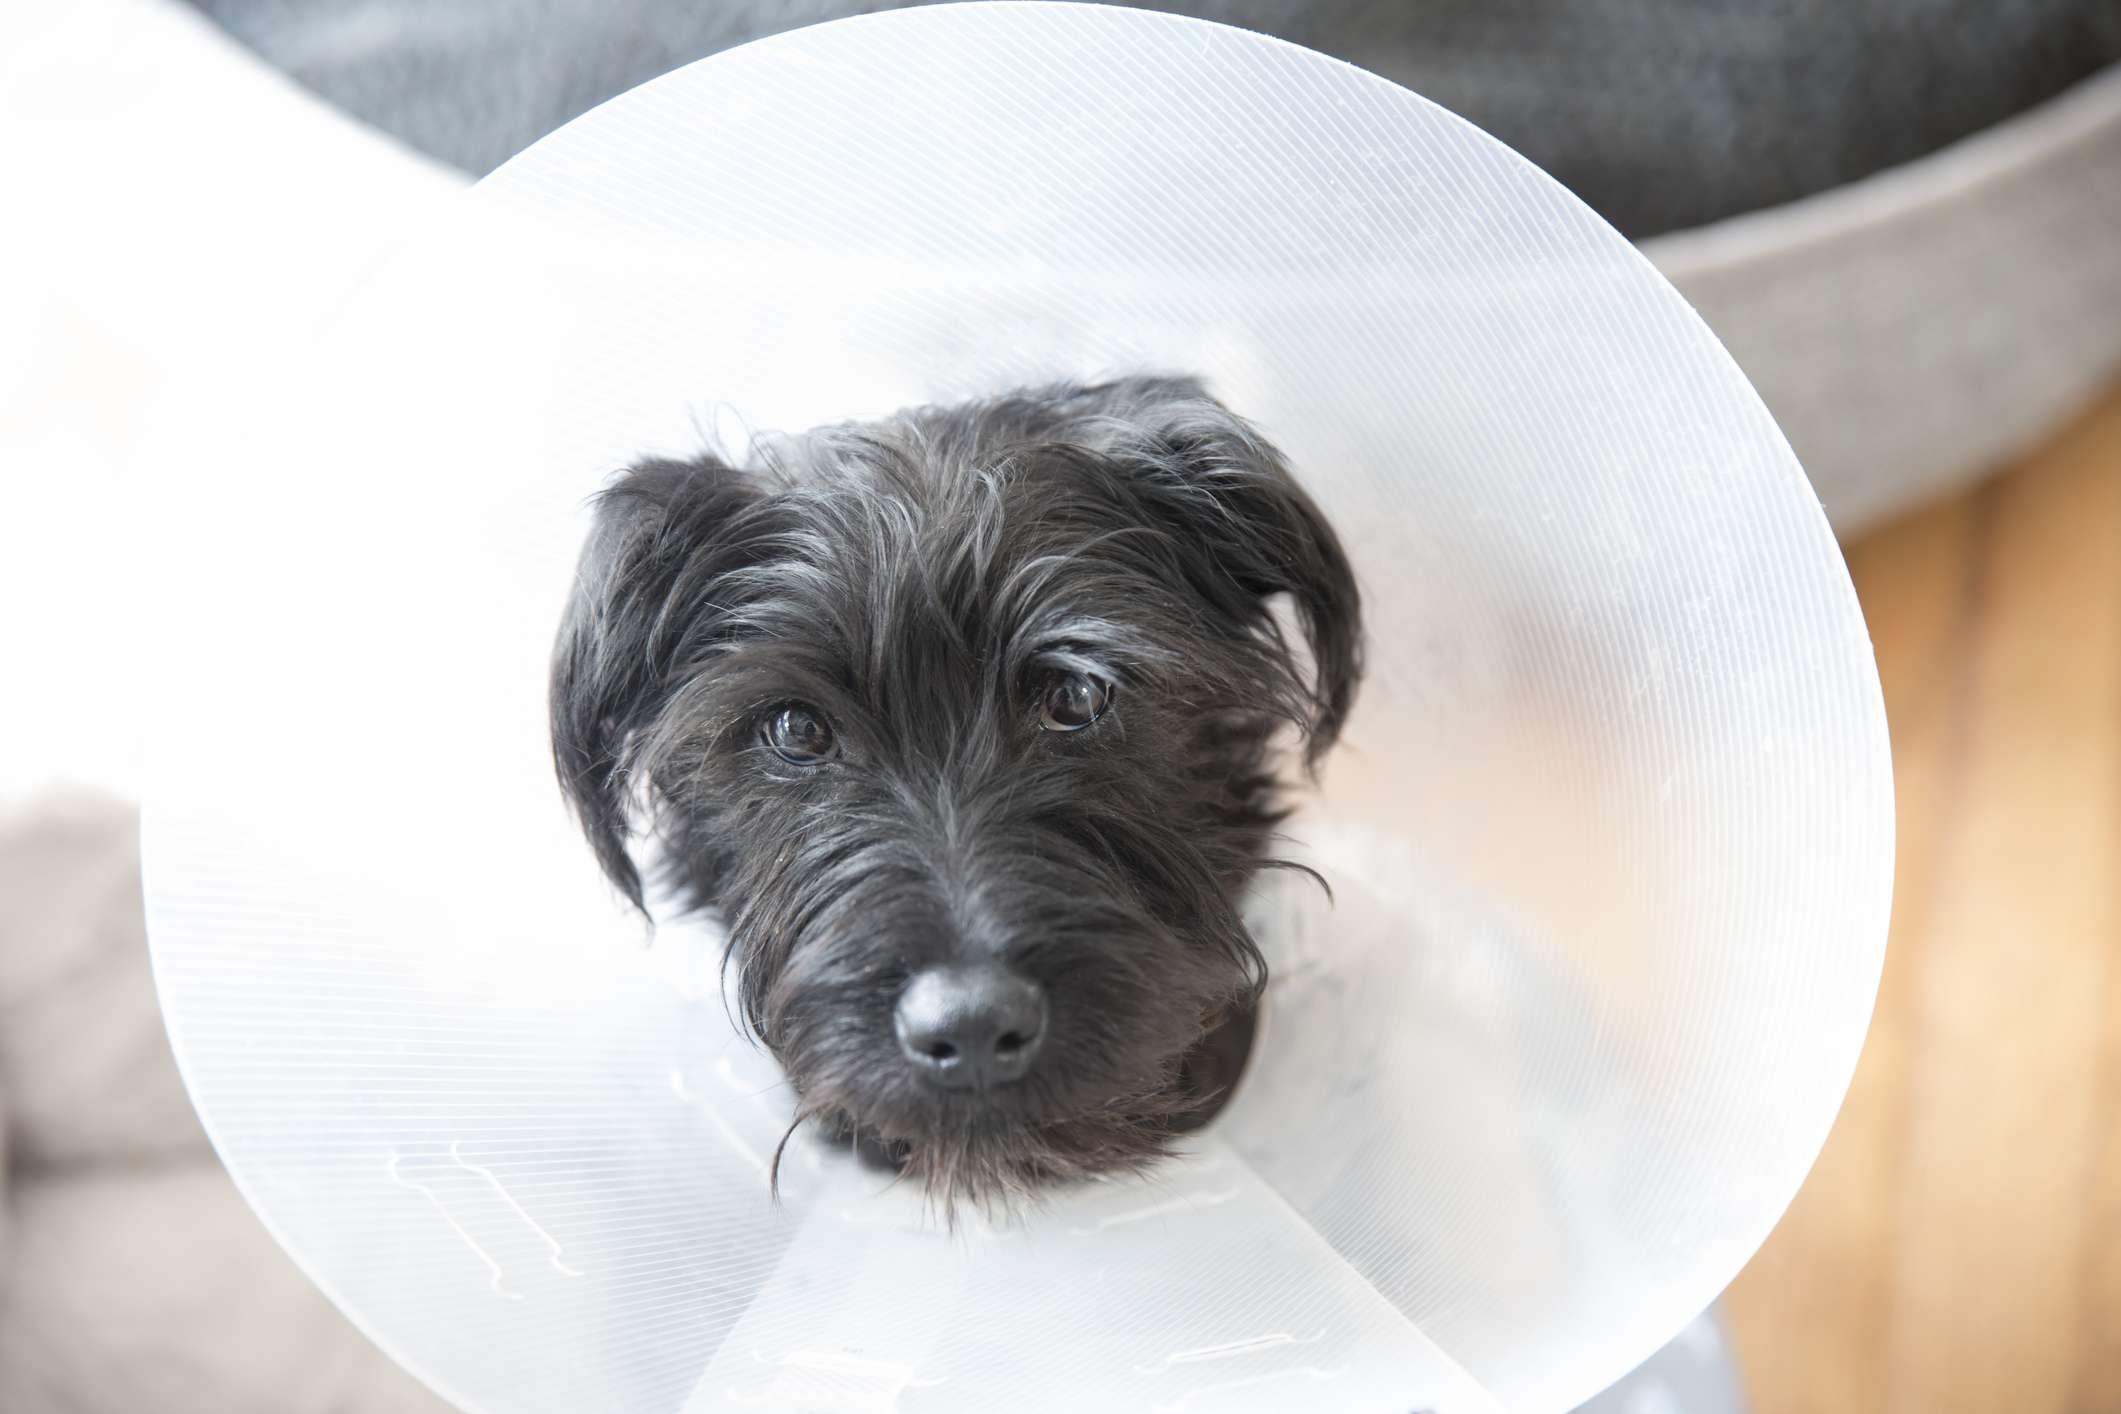 Small dog wearing ecollar